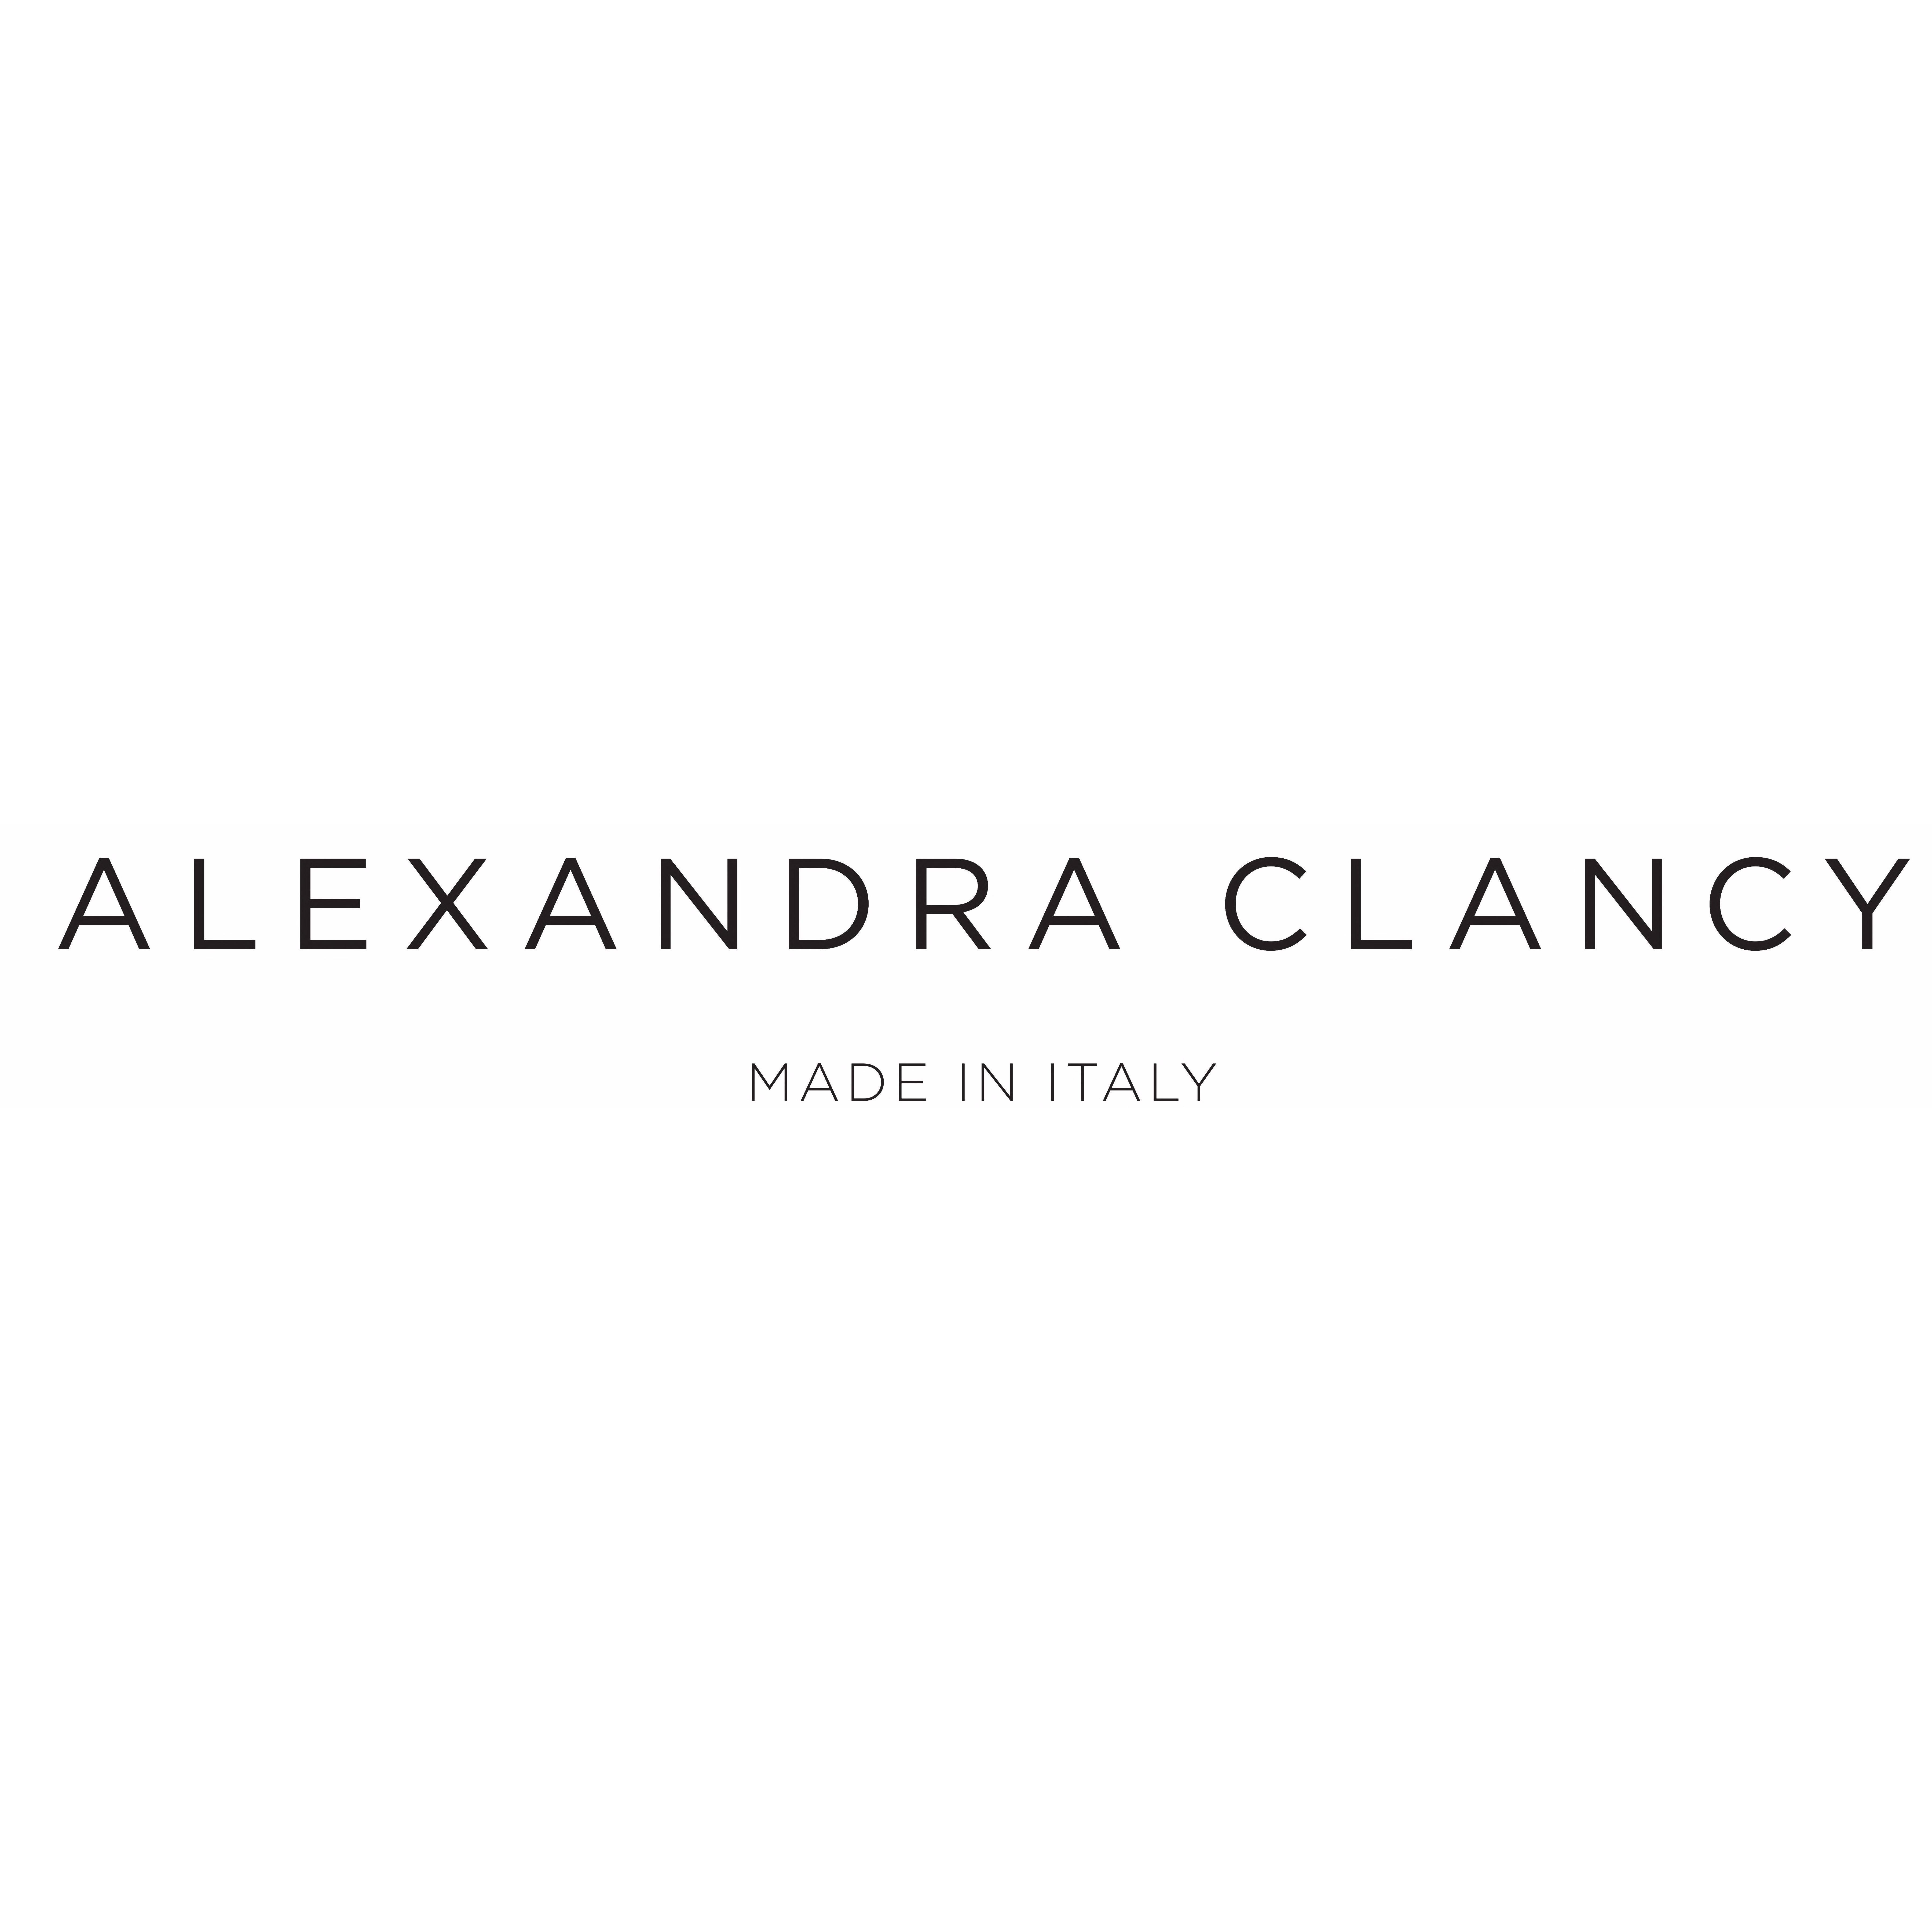 ALEXANDRA CLANCY, LLC